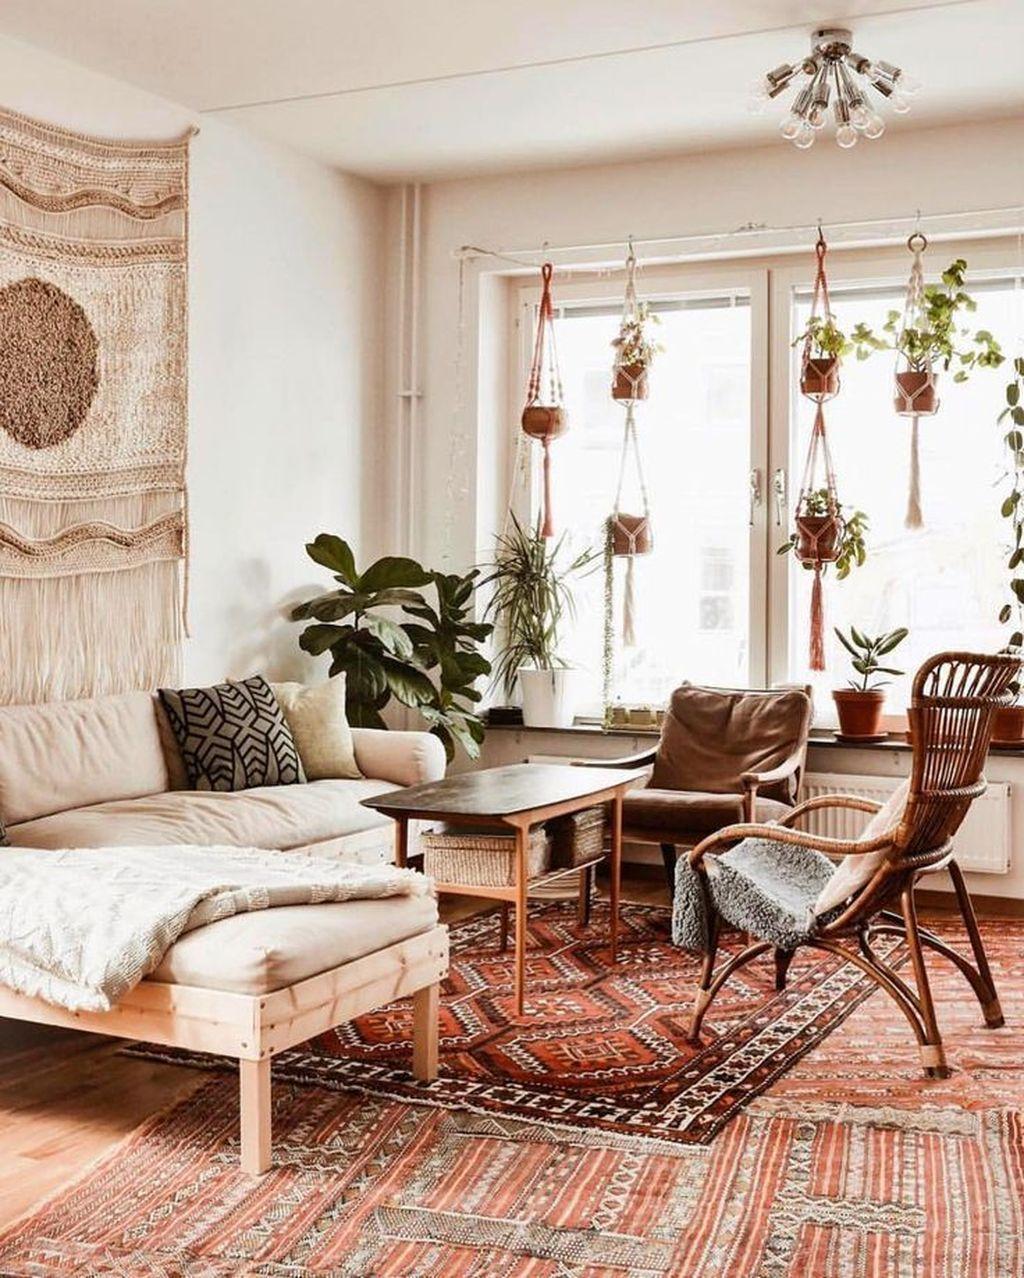 43 Elegant Bohemian Style Living Room Decoration Ideas Idees De